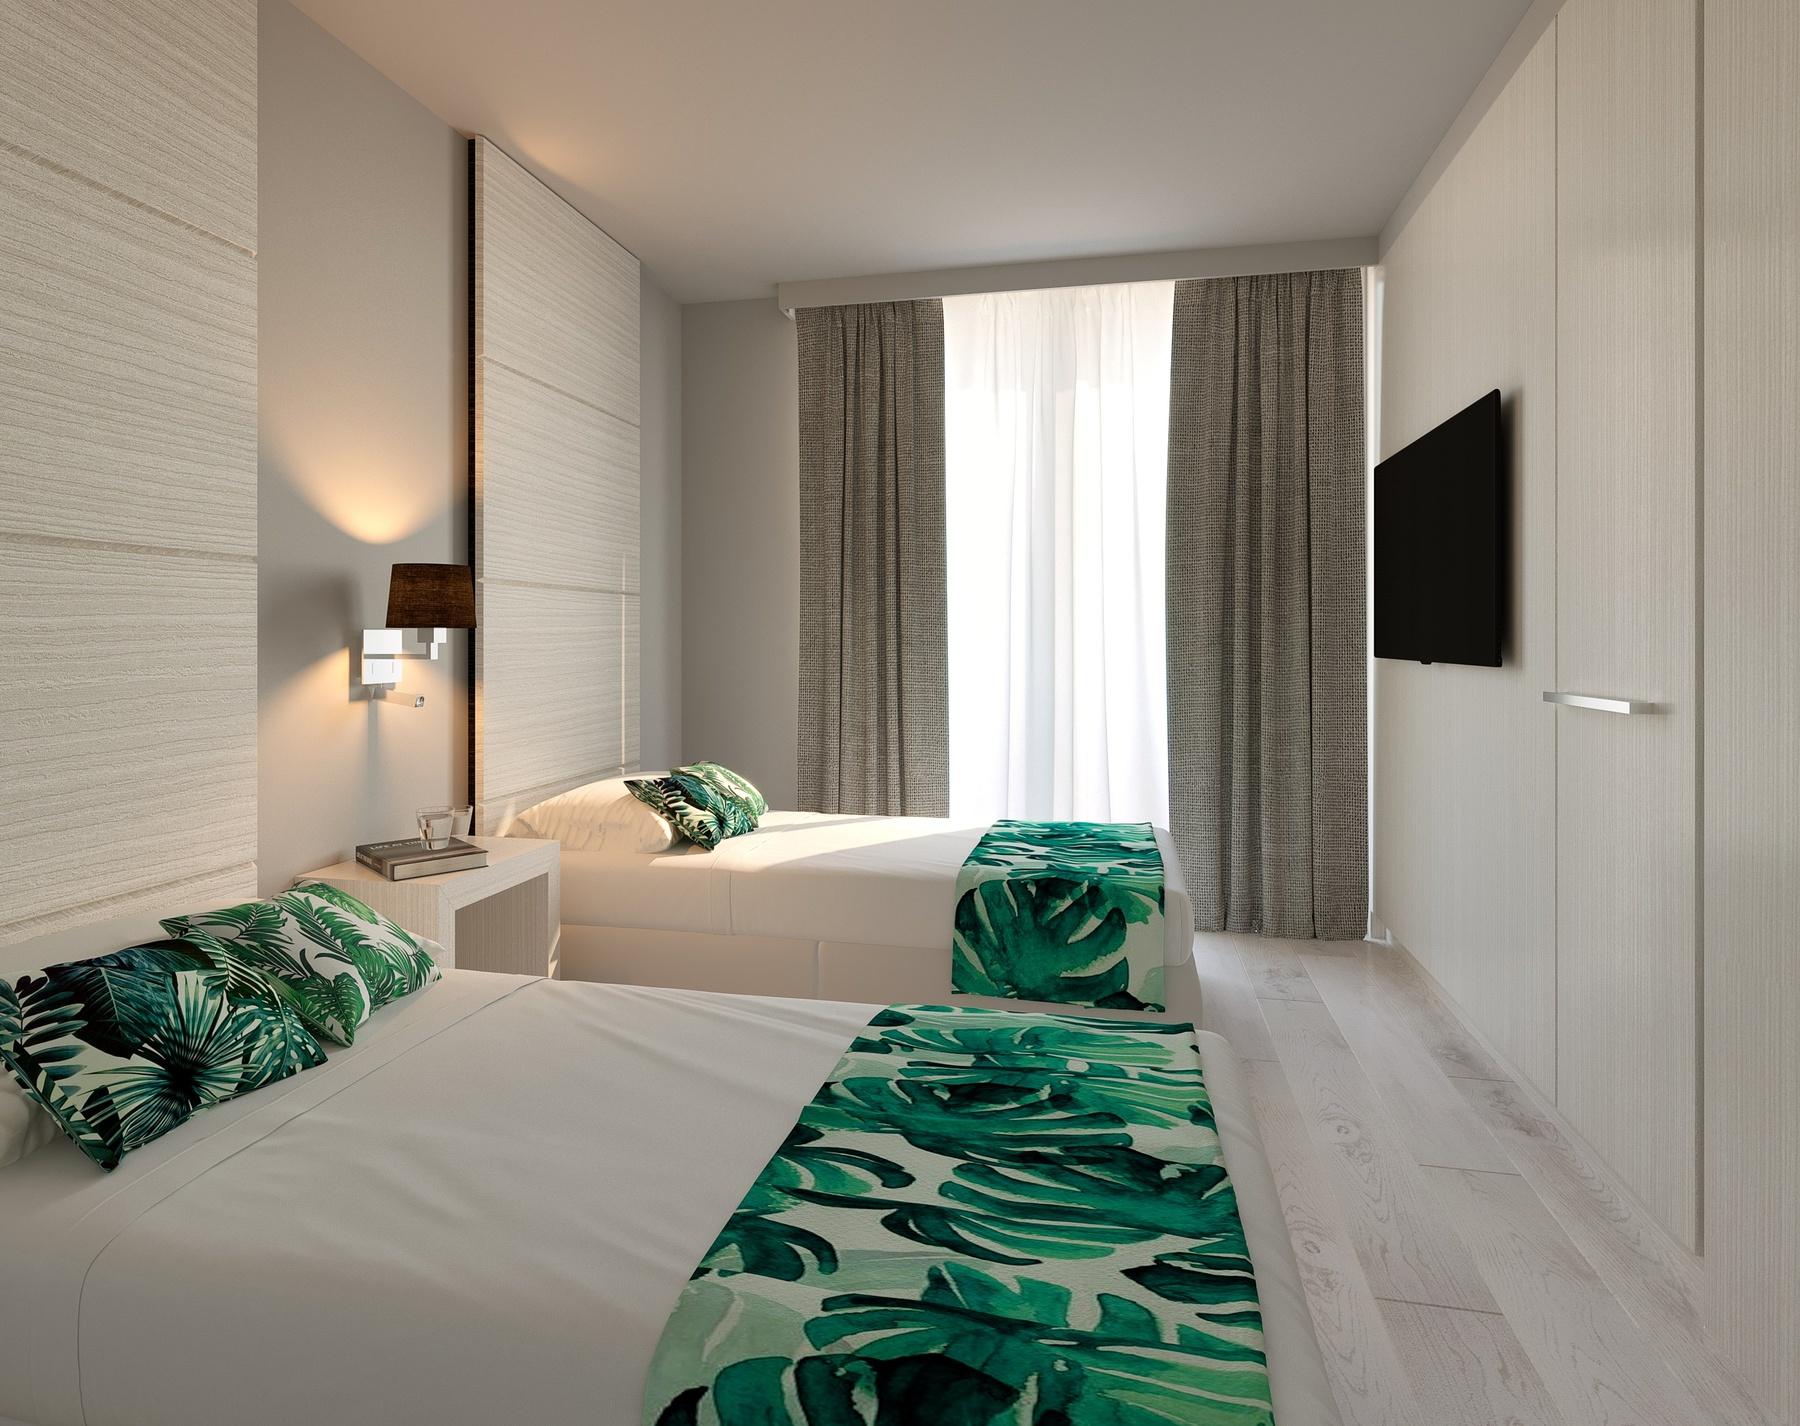 Habitaciones Hotel Golden Port Salou & Spa Costa Dorada